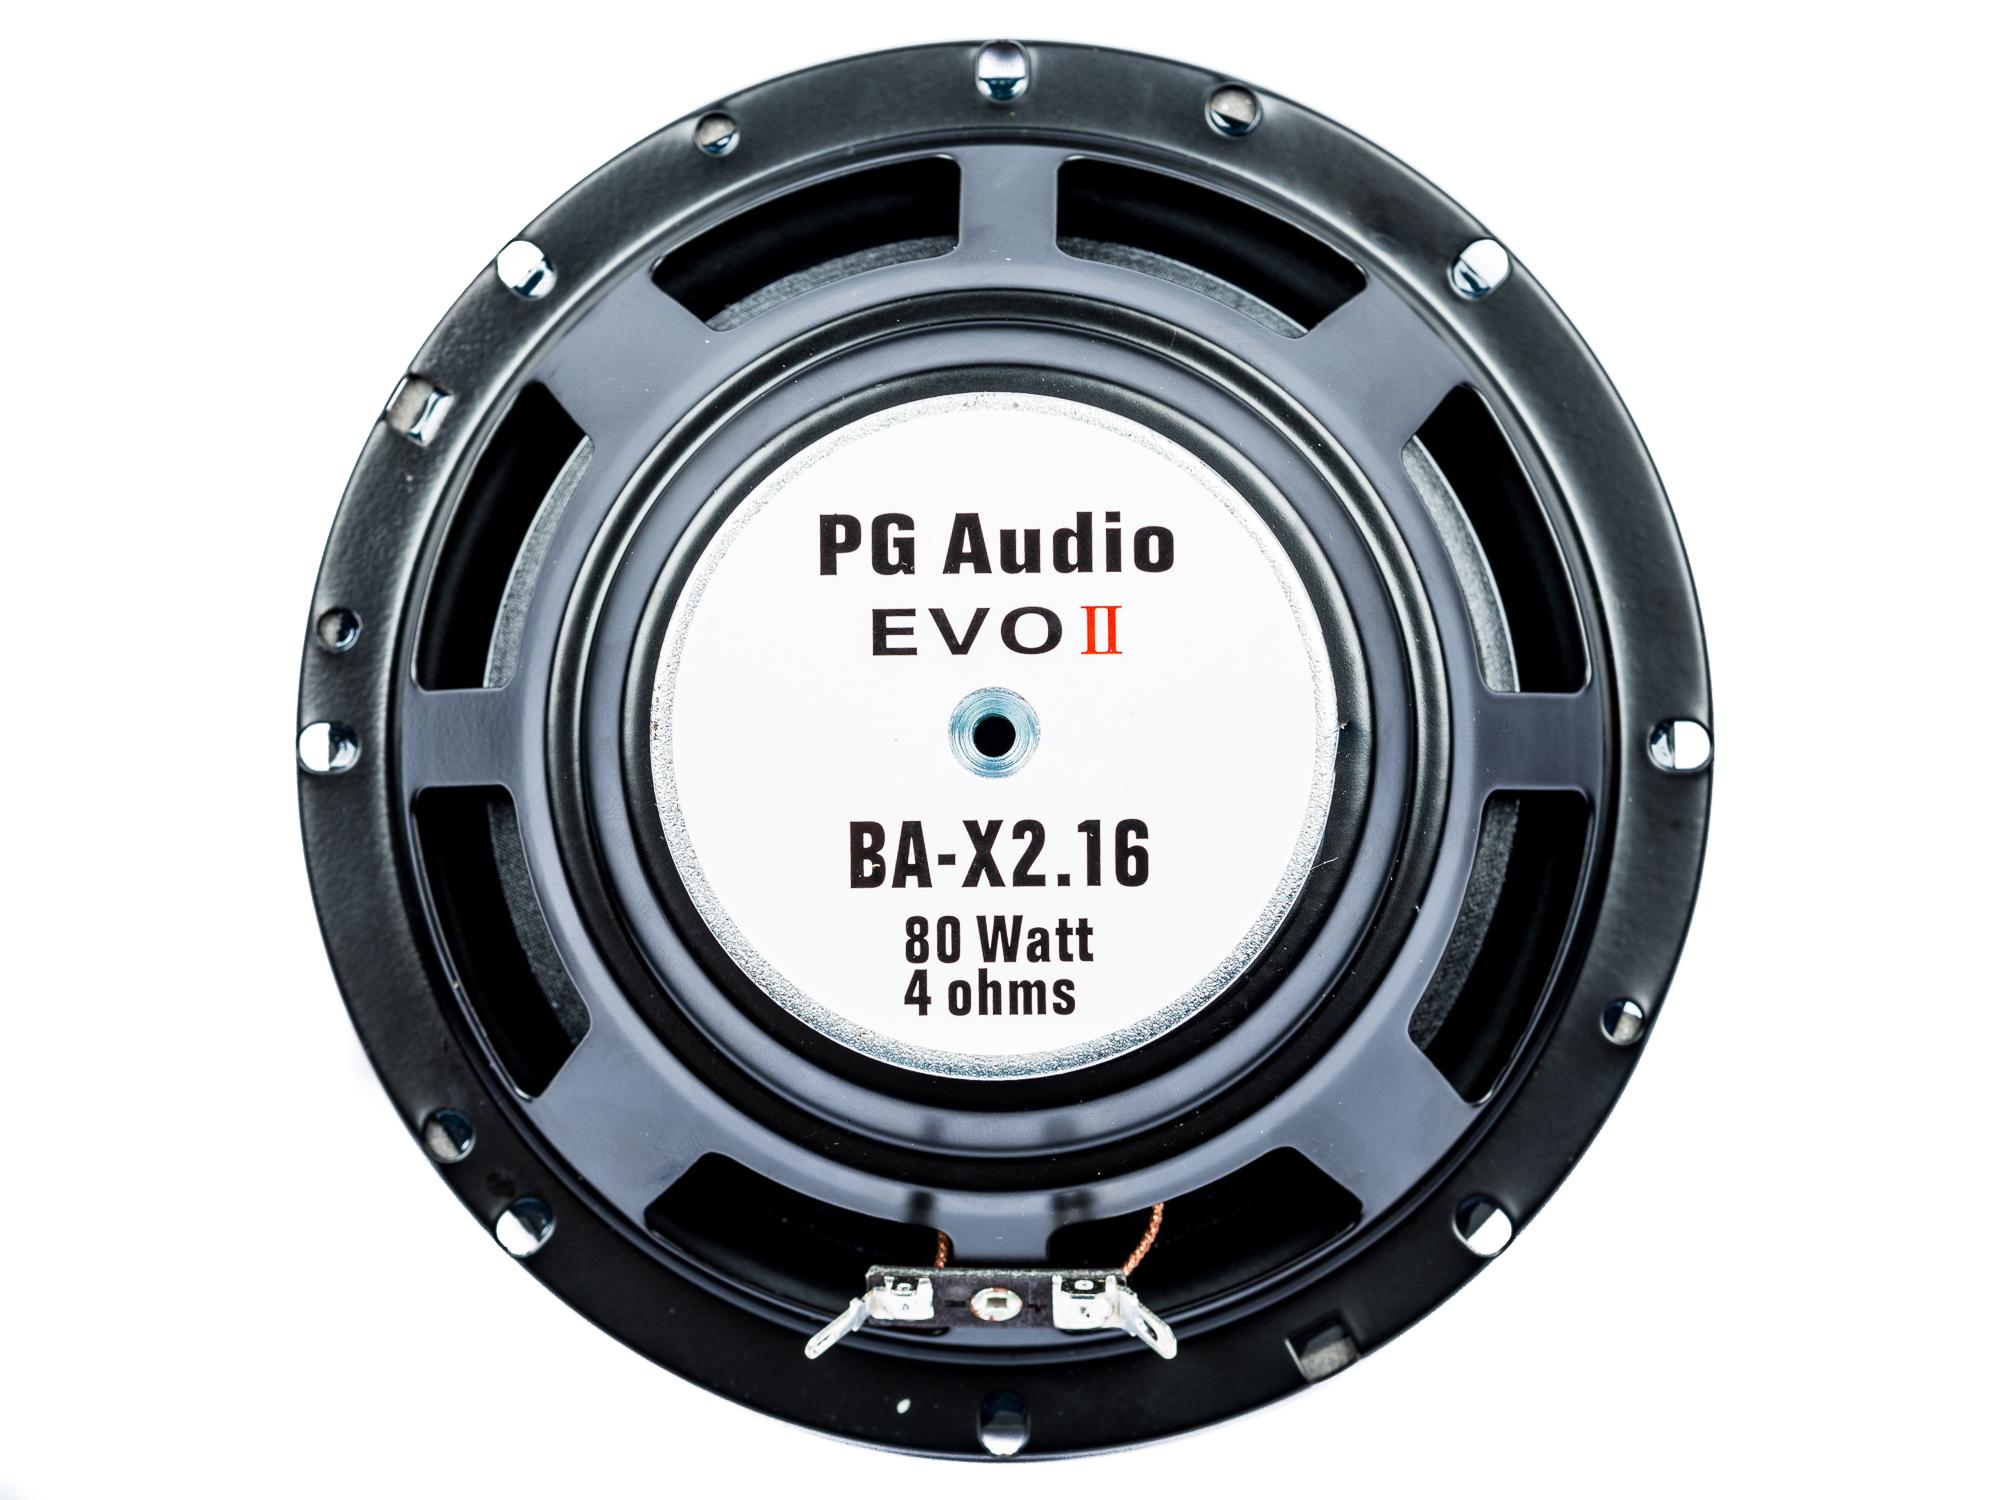 VW Golf 7, VW Polo 9N, VW Up, Lautsprecher, Boxen, Tür vorne, PG Audio Evo II 2.16 – Bild 3